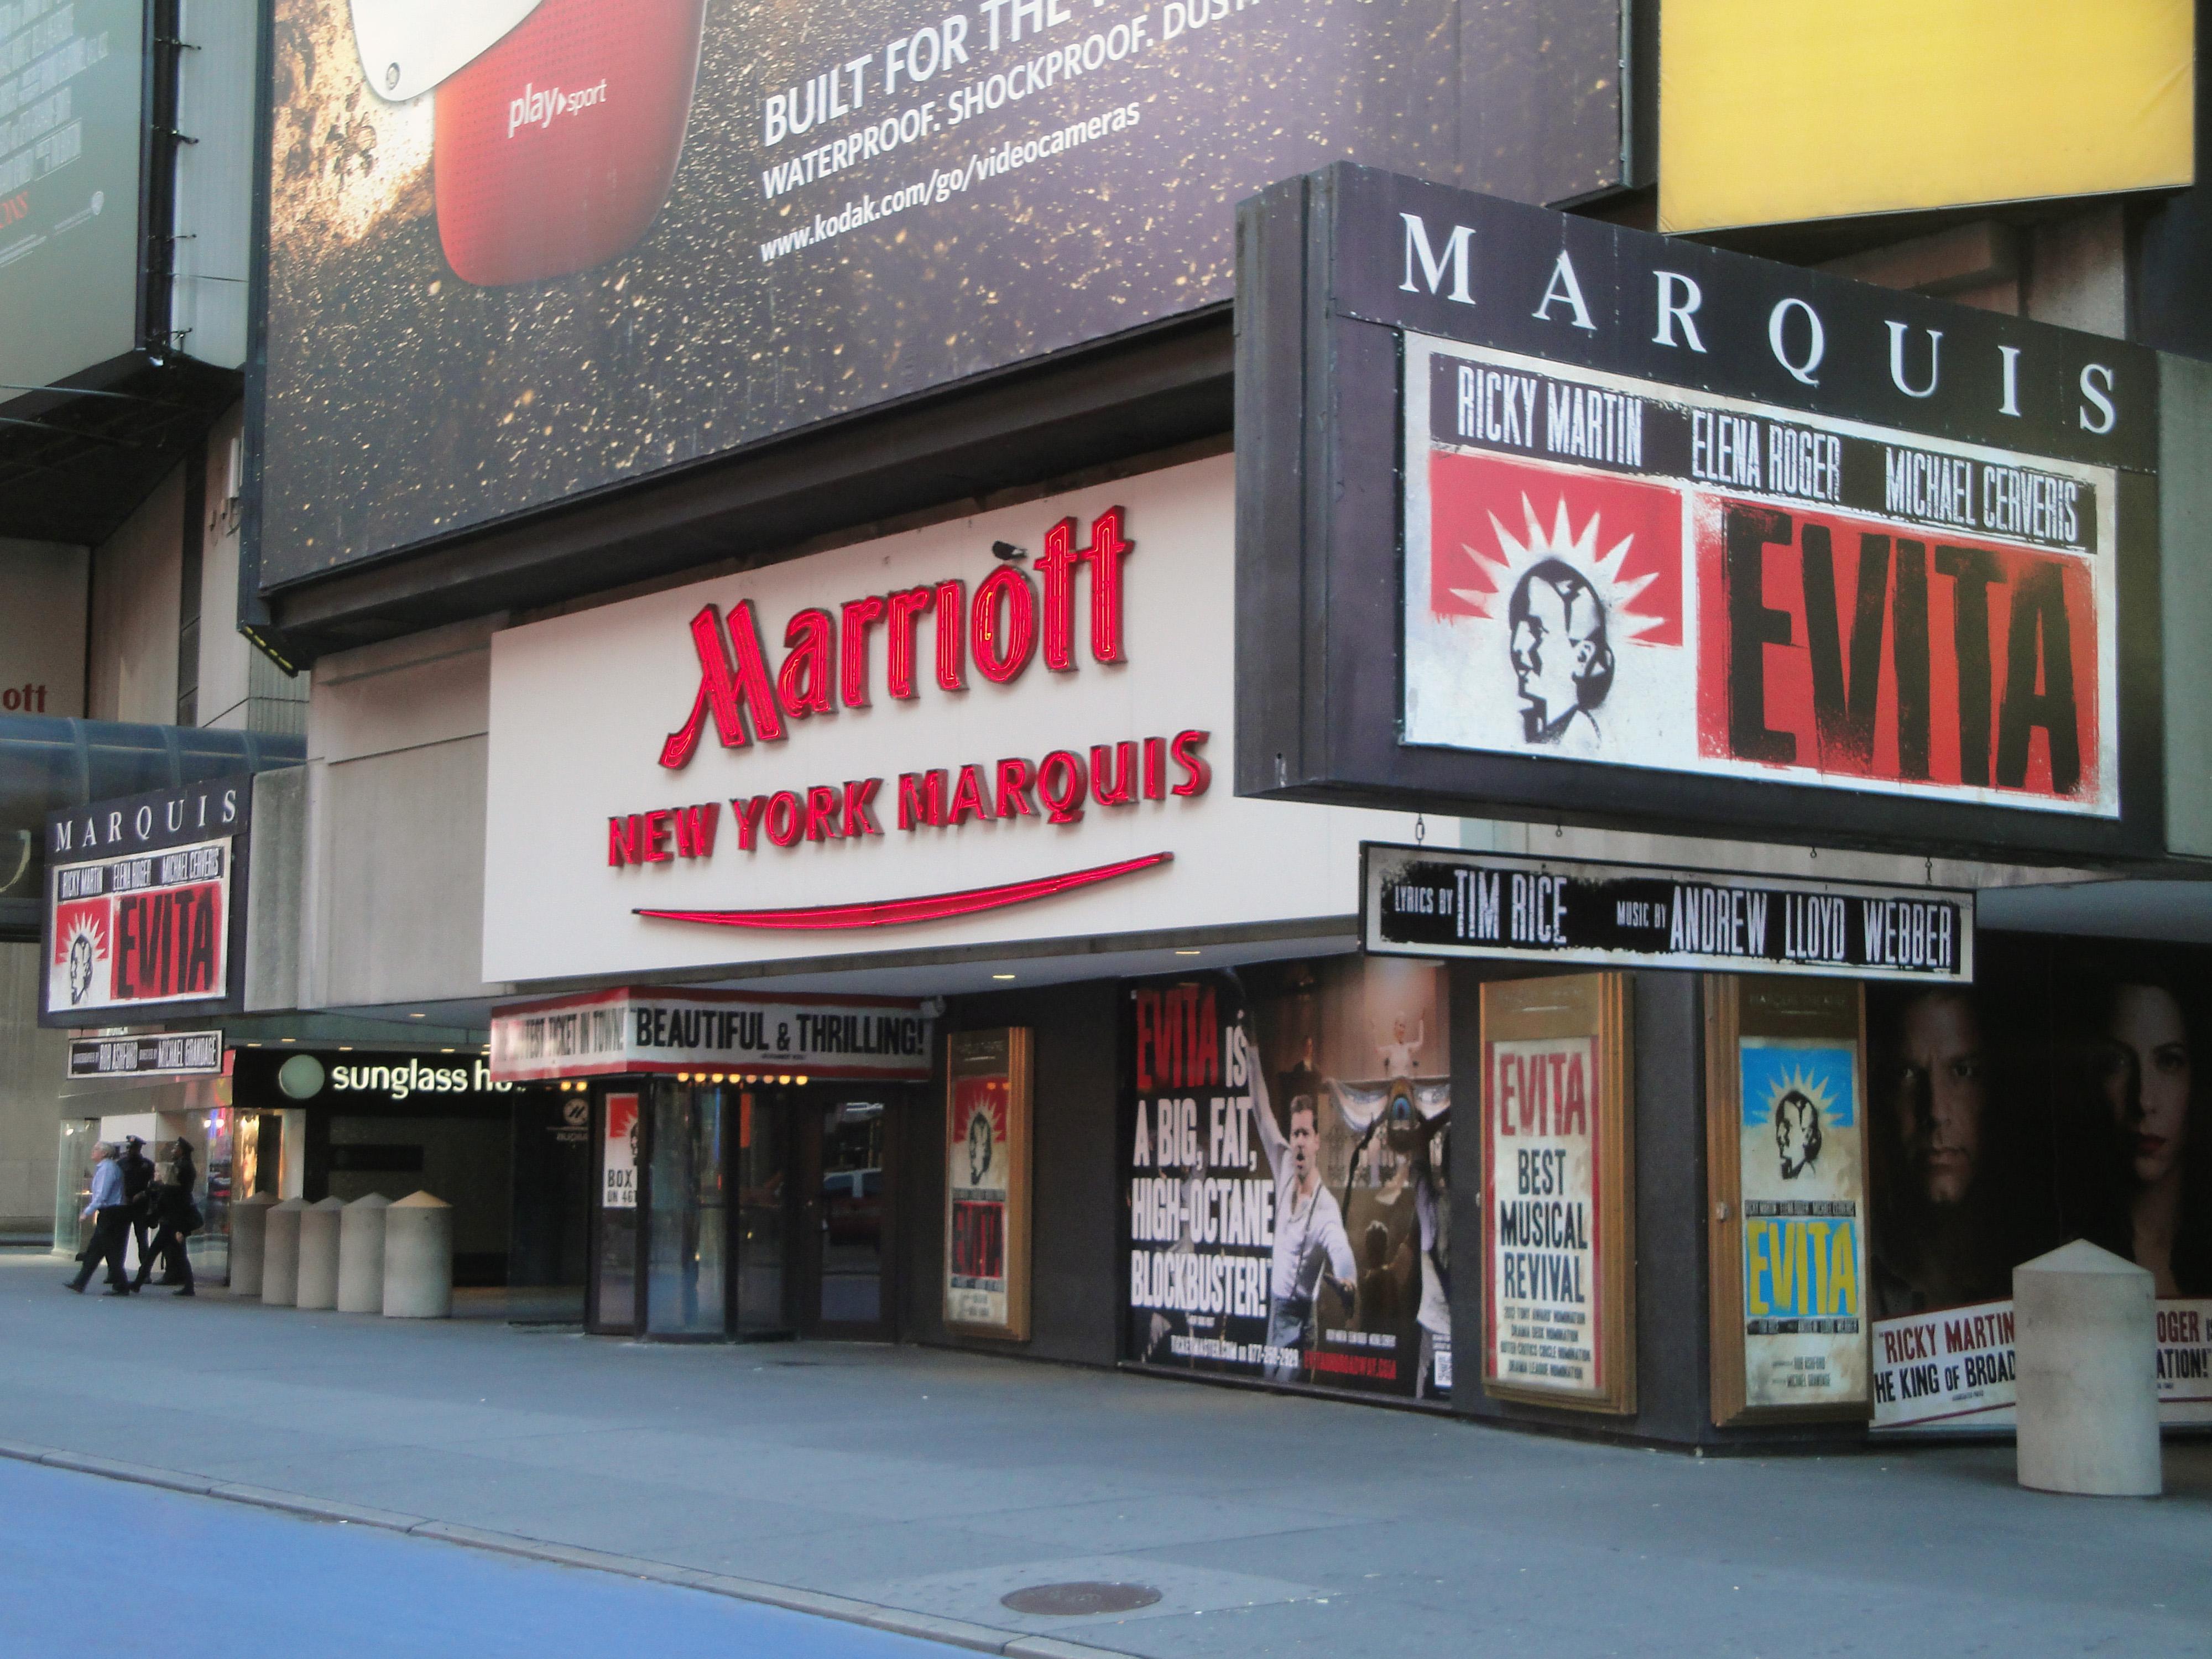 Marquis Theatre Tickets